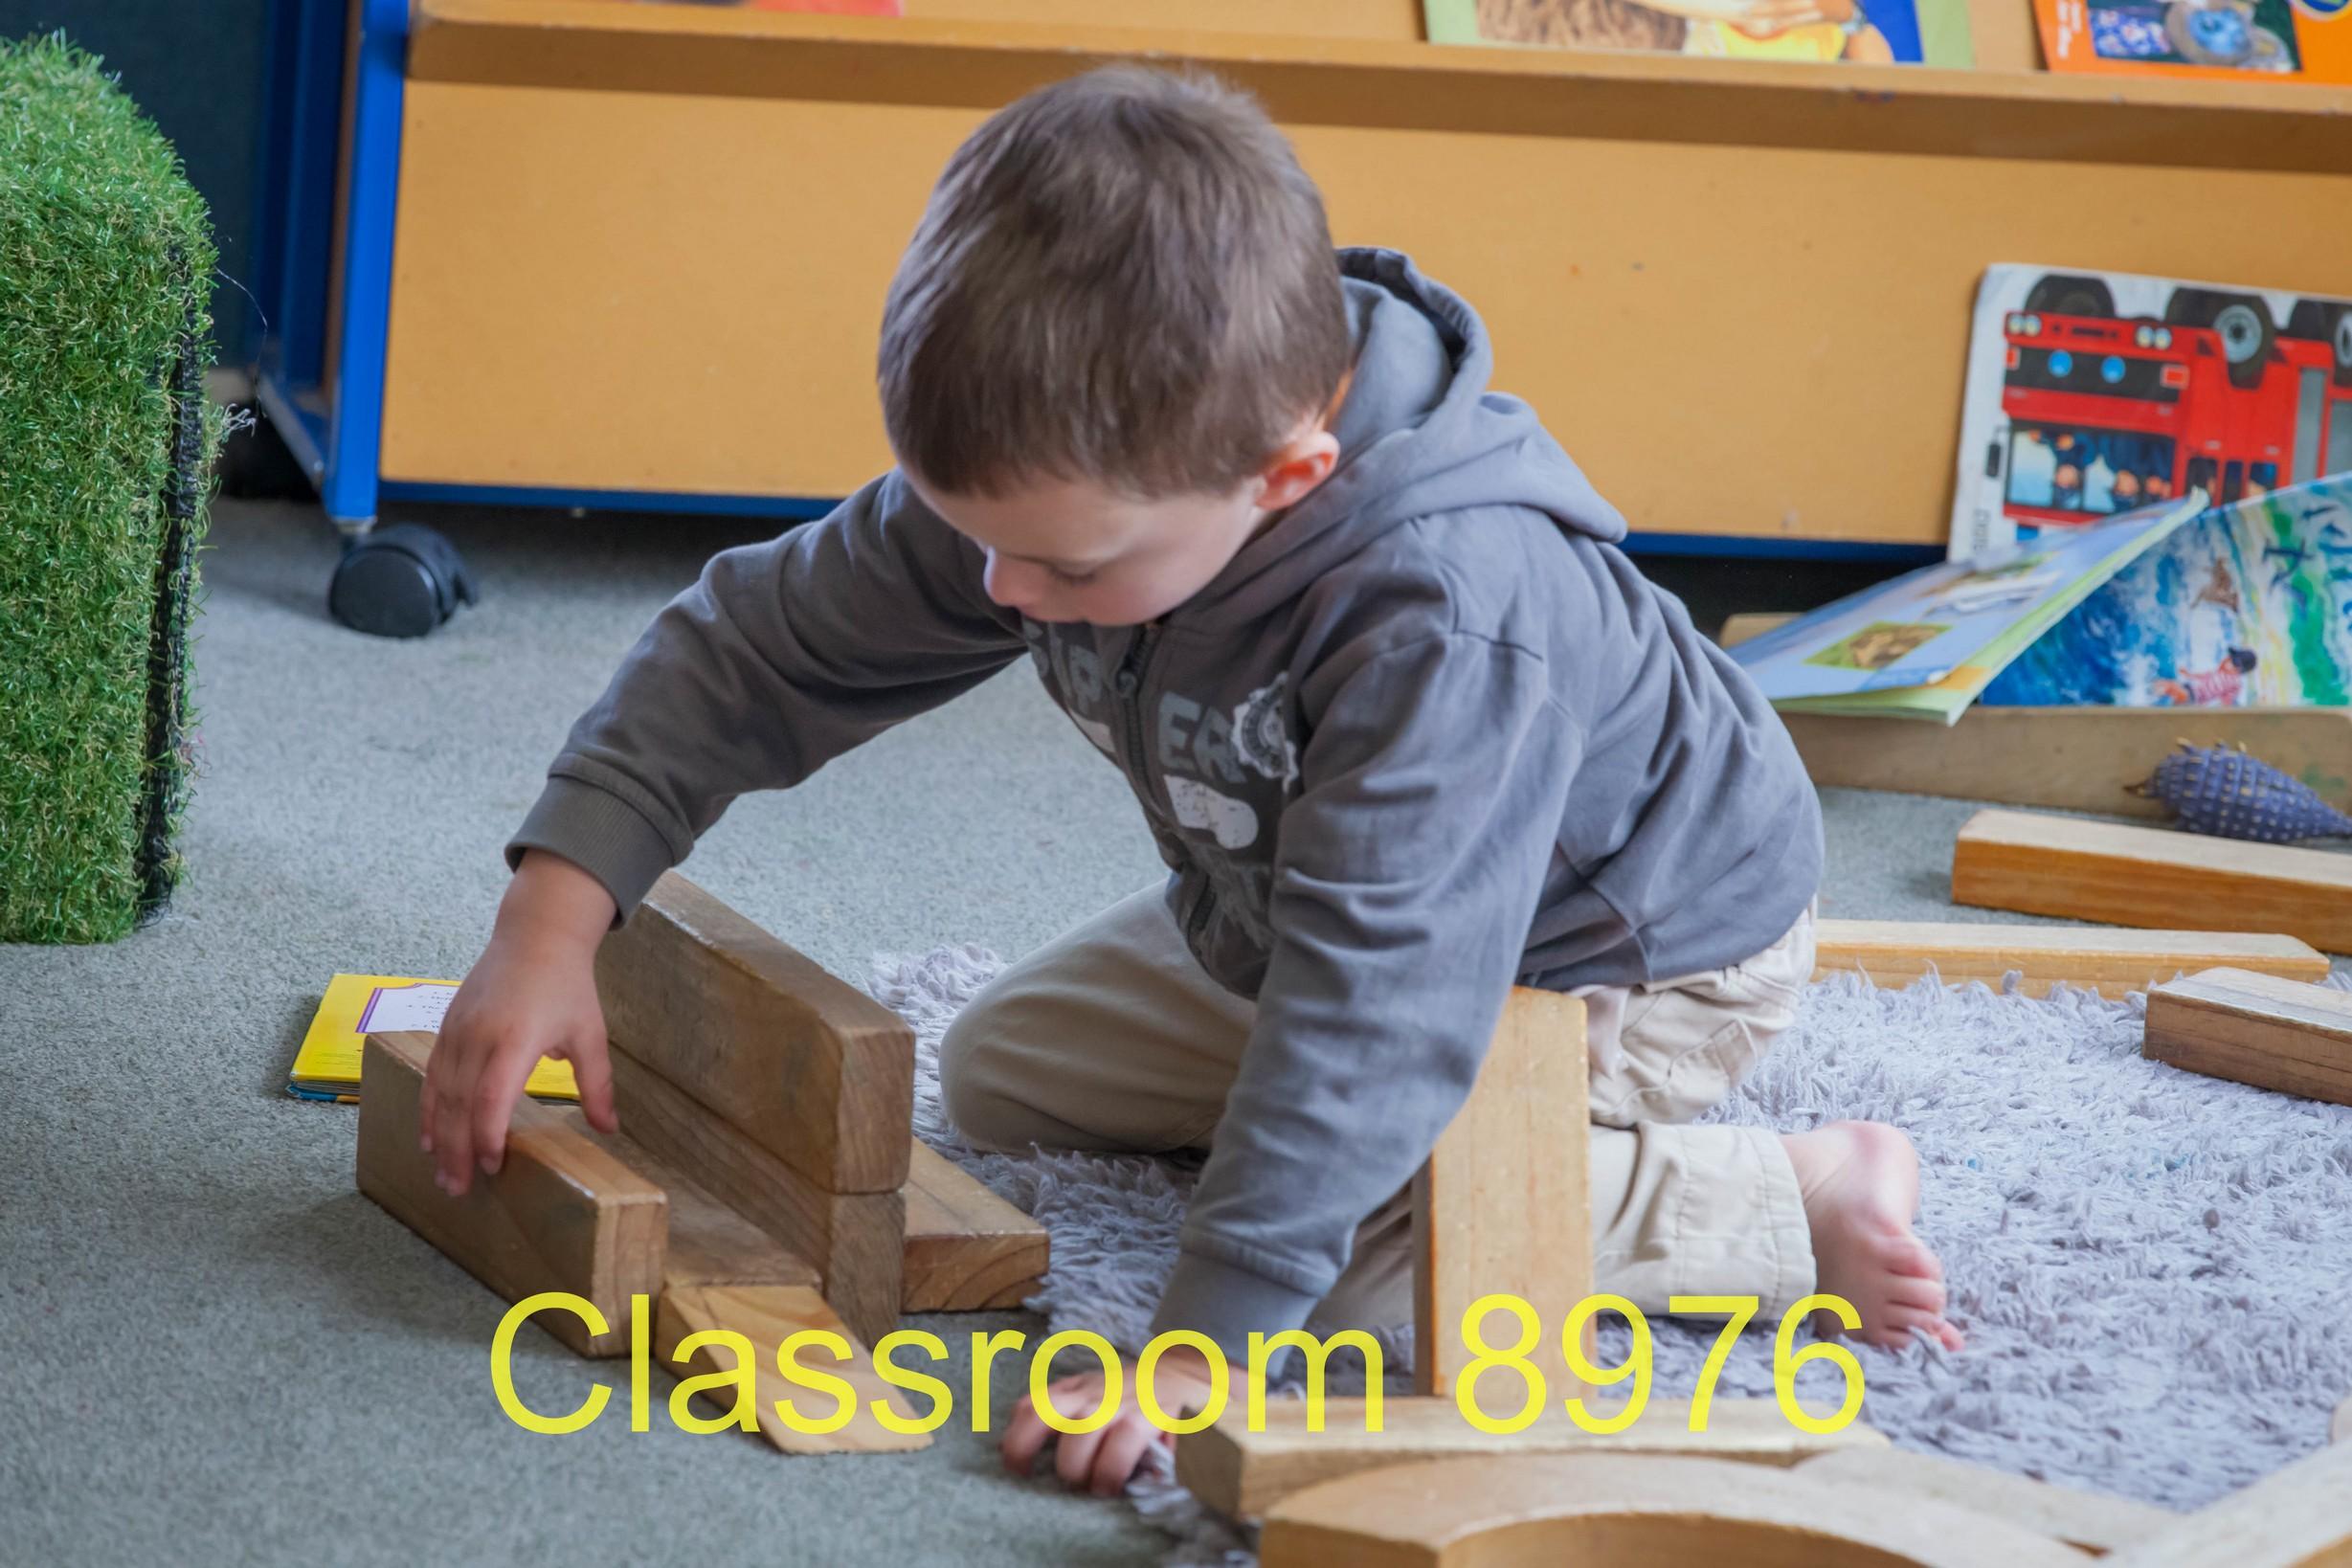 Classroom 8976